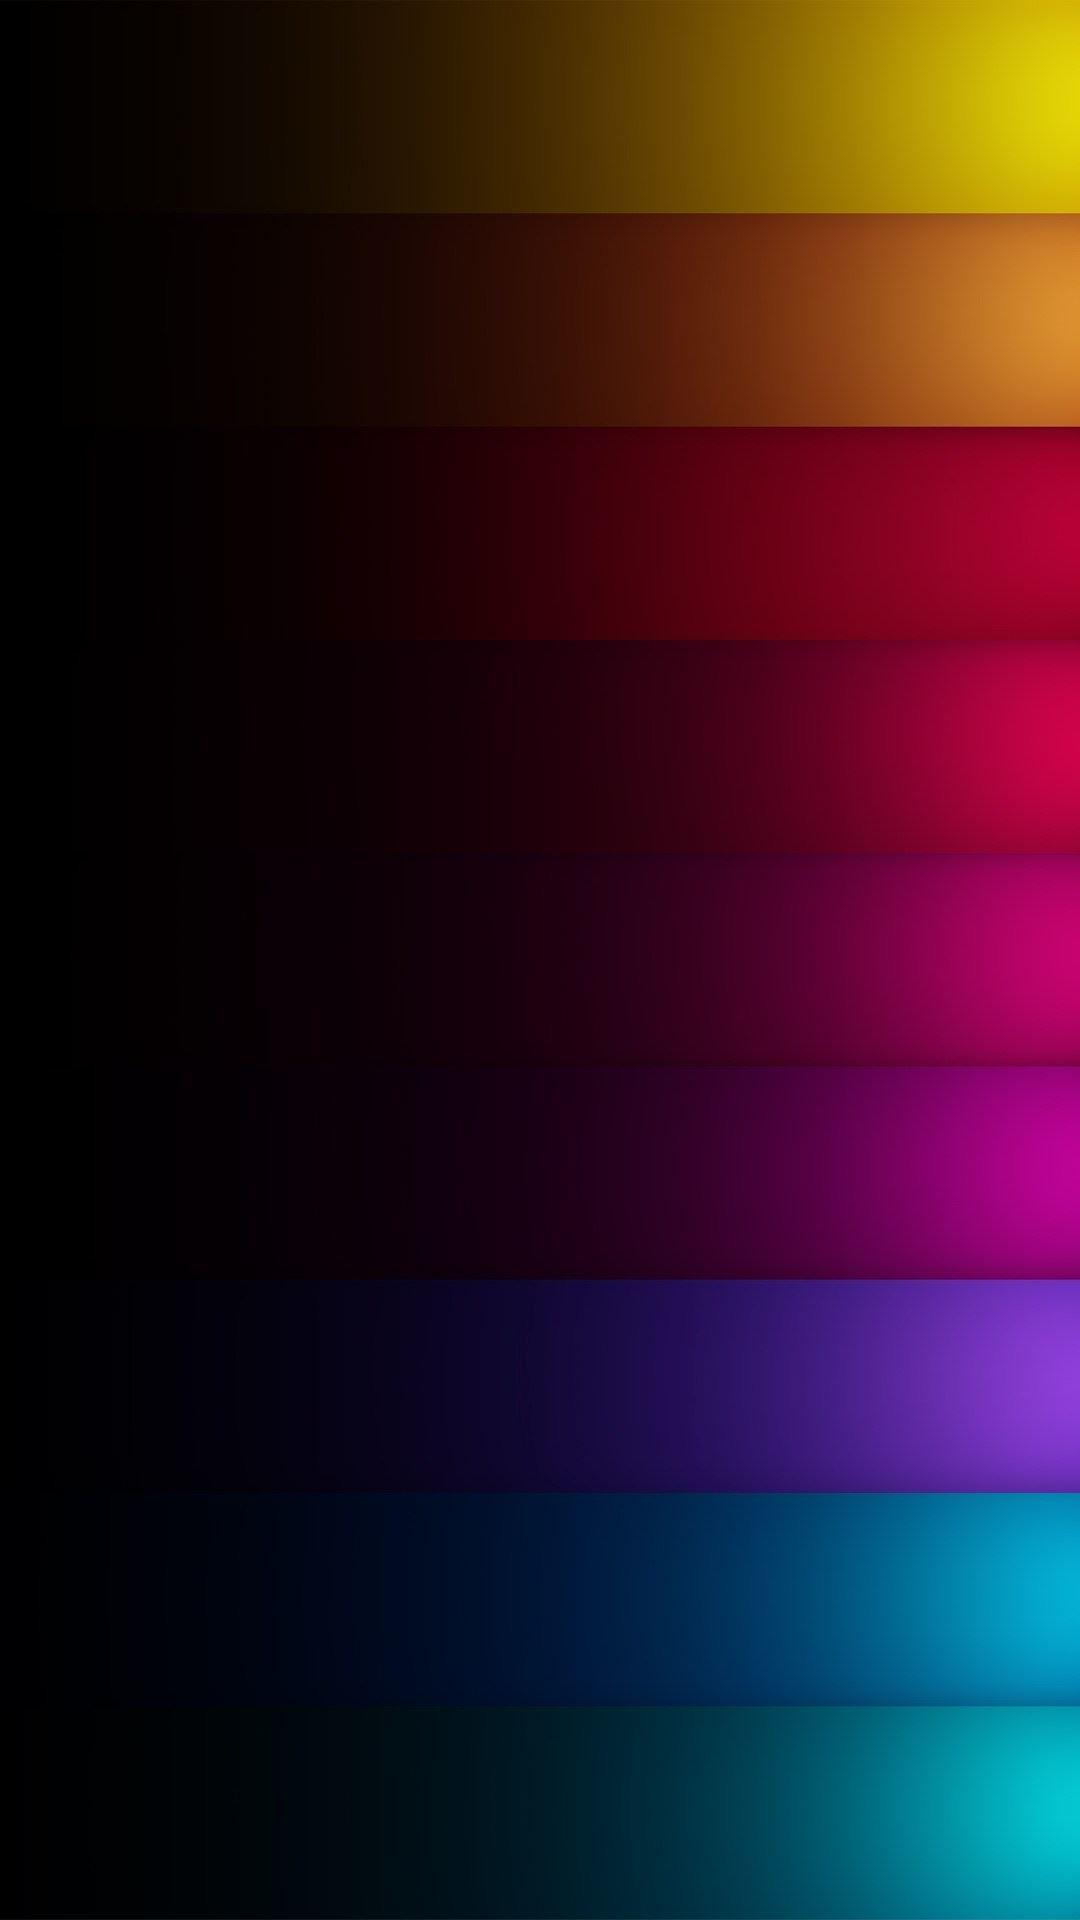 Dark Shadow Colored Rainbow Rows iPhone 6 Plus HD Wallpaper …